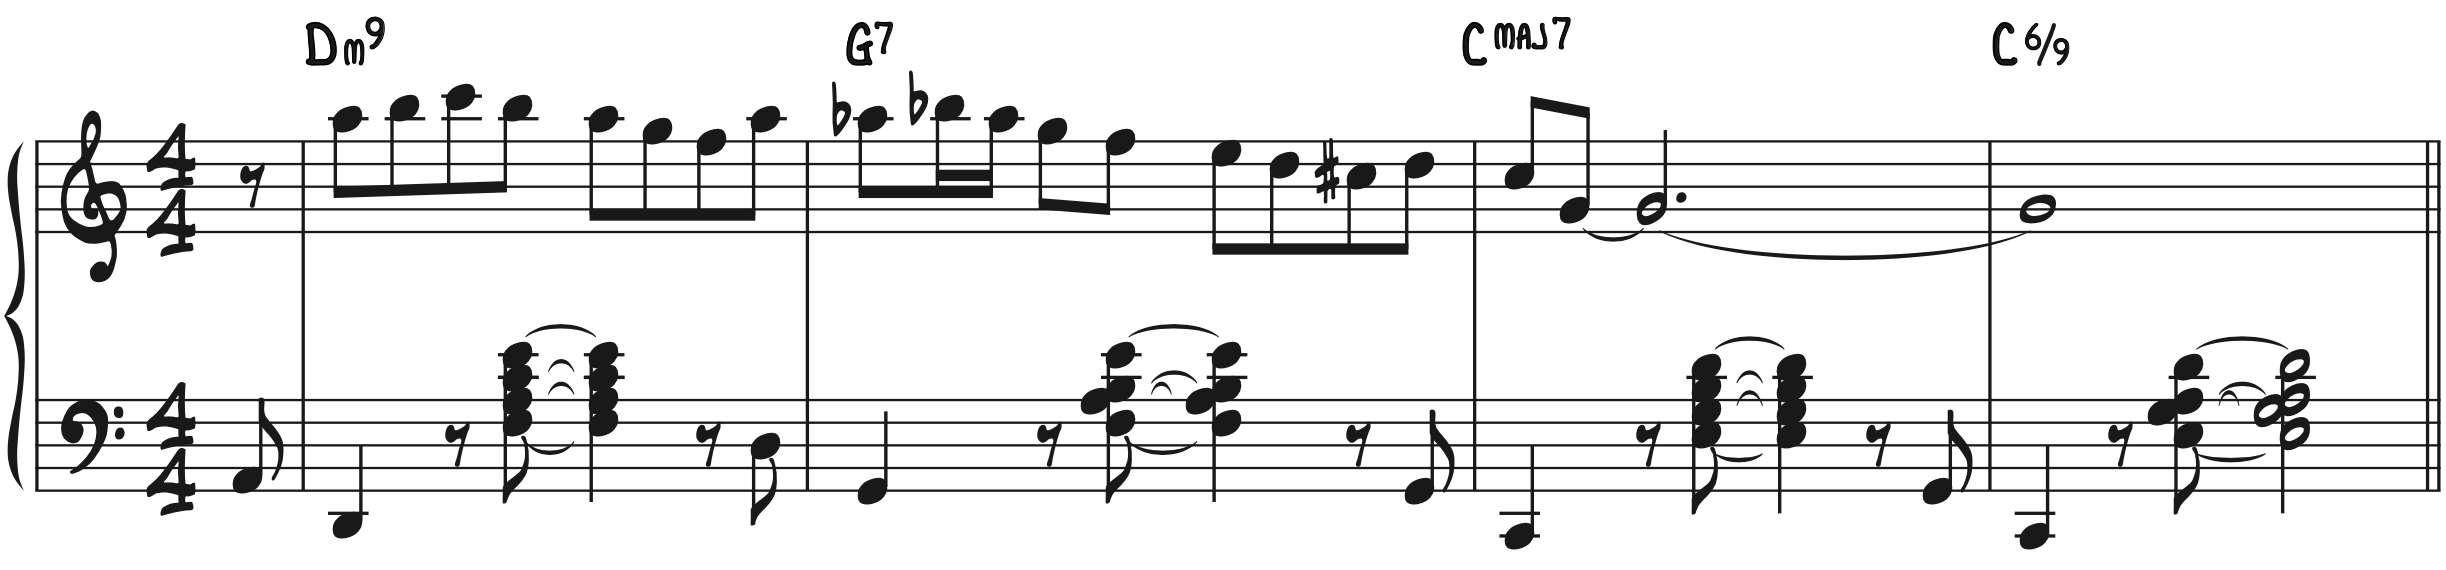 Dominant Diminished Scale Improv Example Jazz Piano